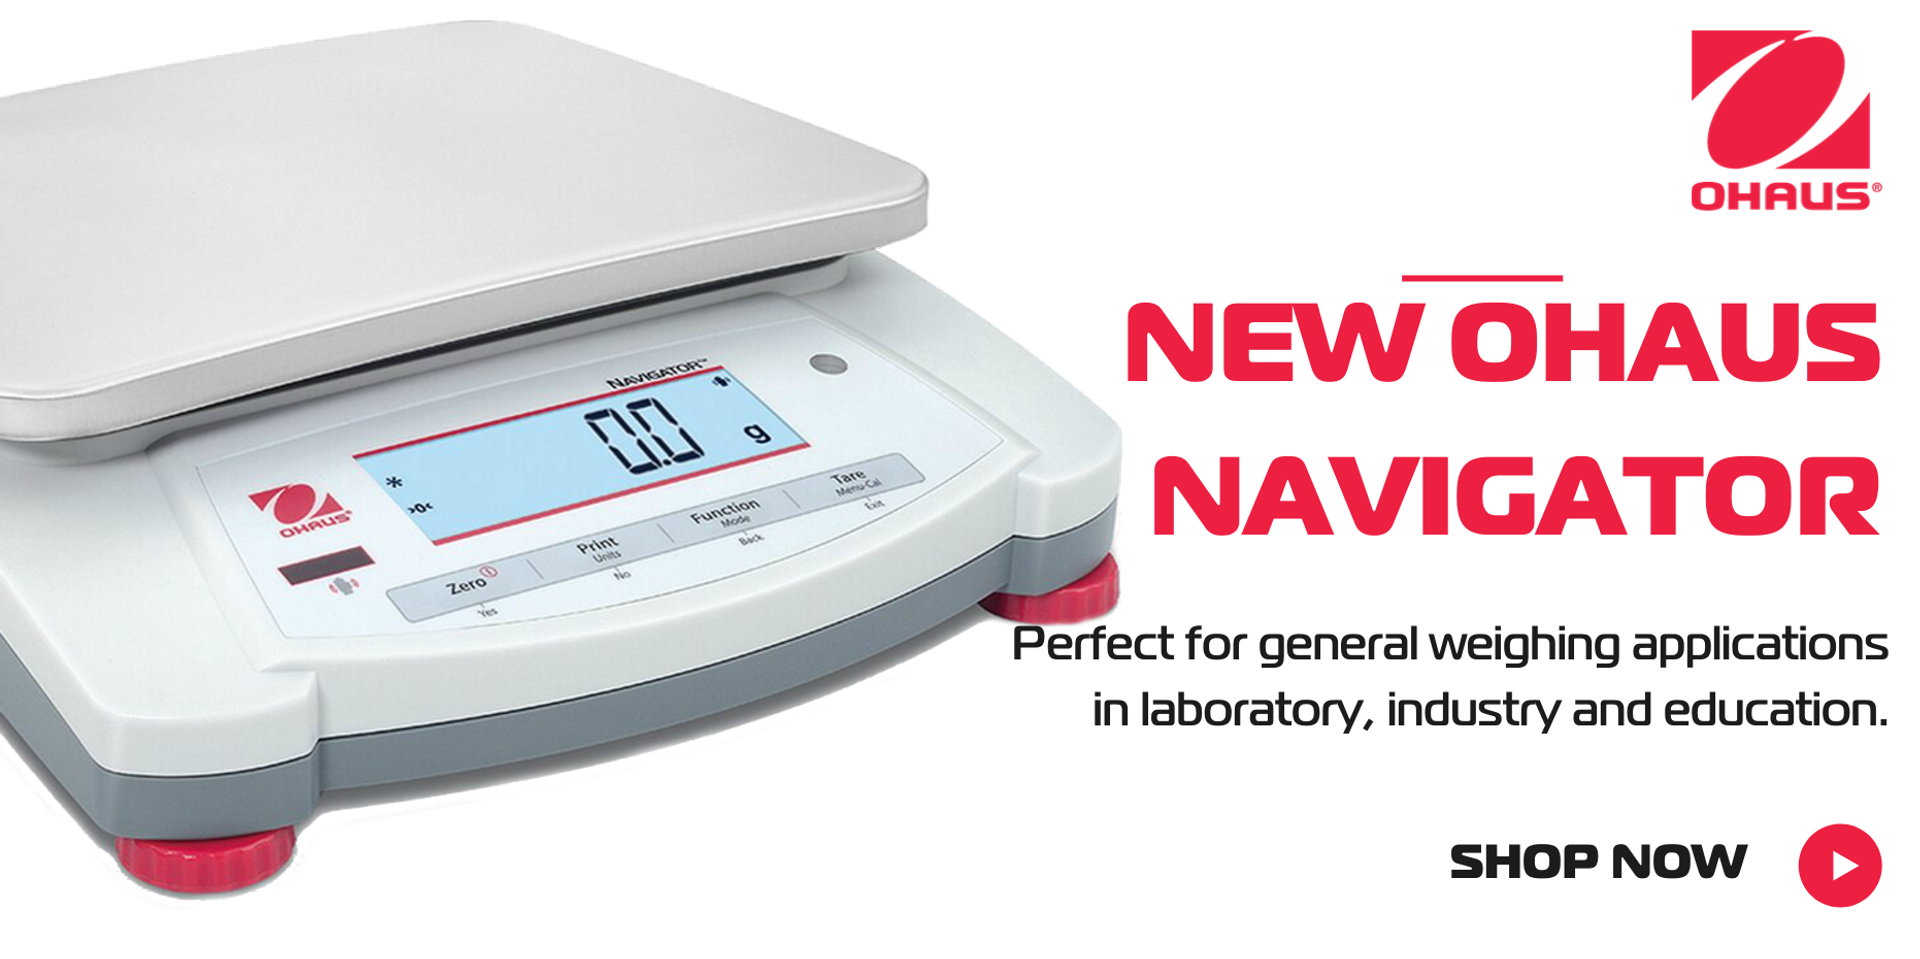 Newly re-designed Ohaus Navigator